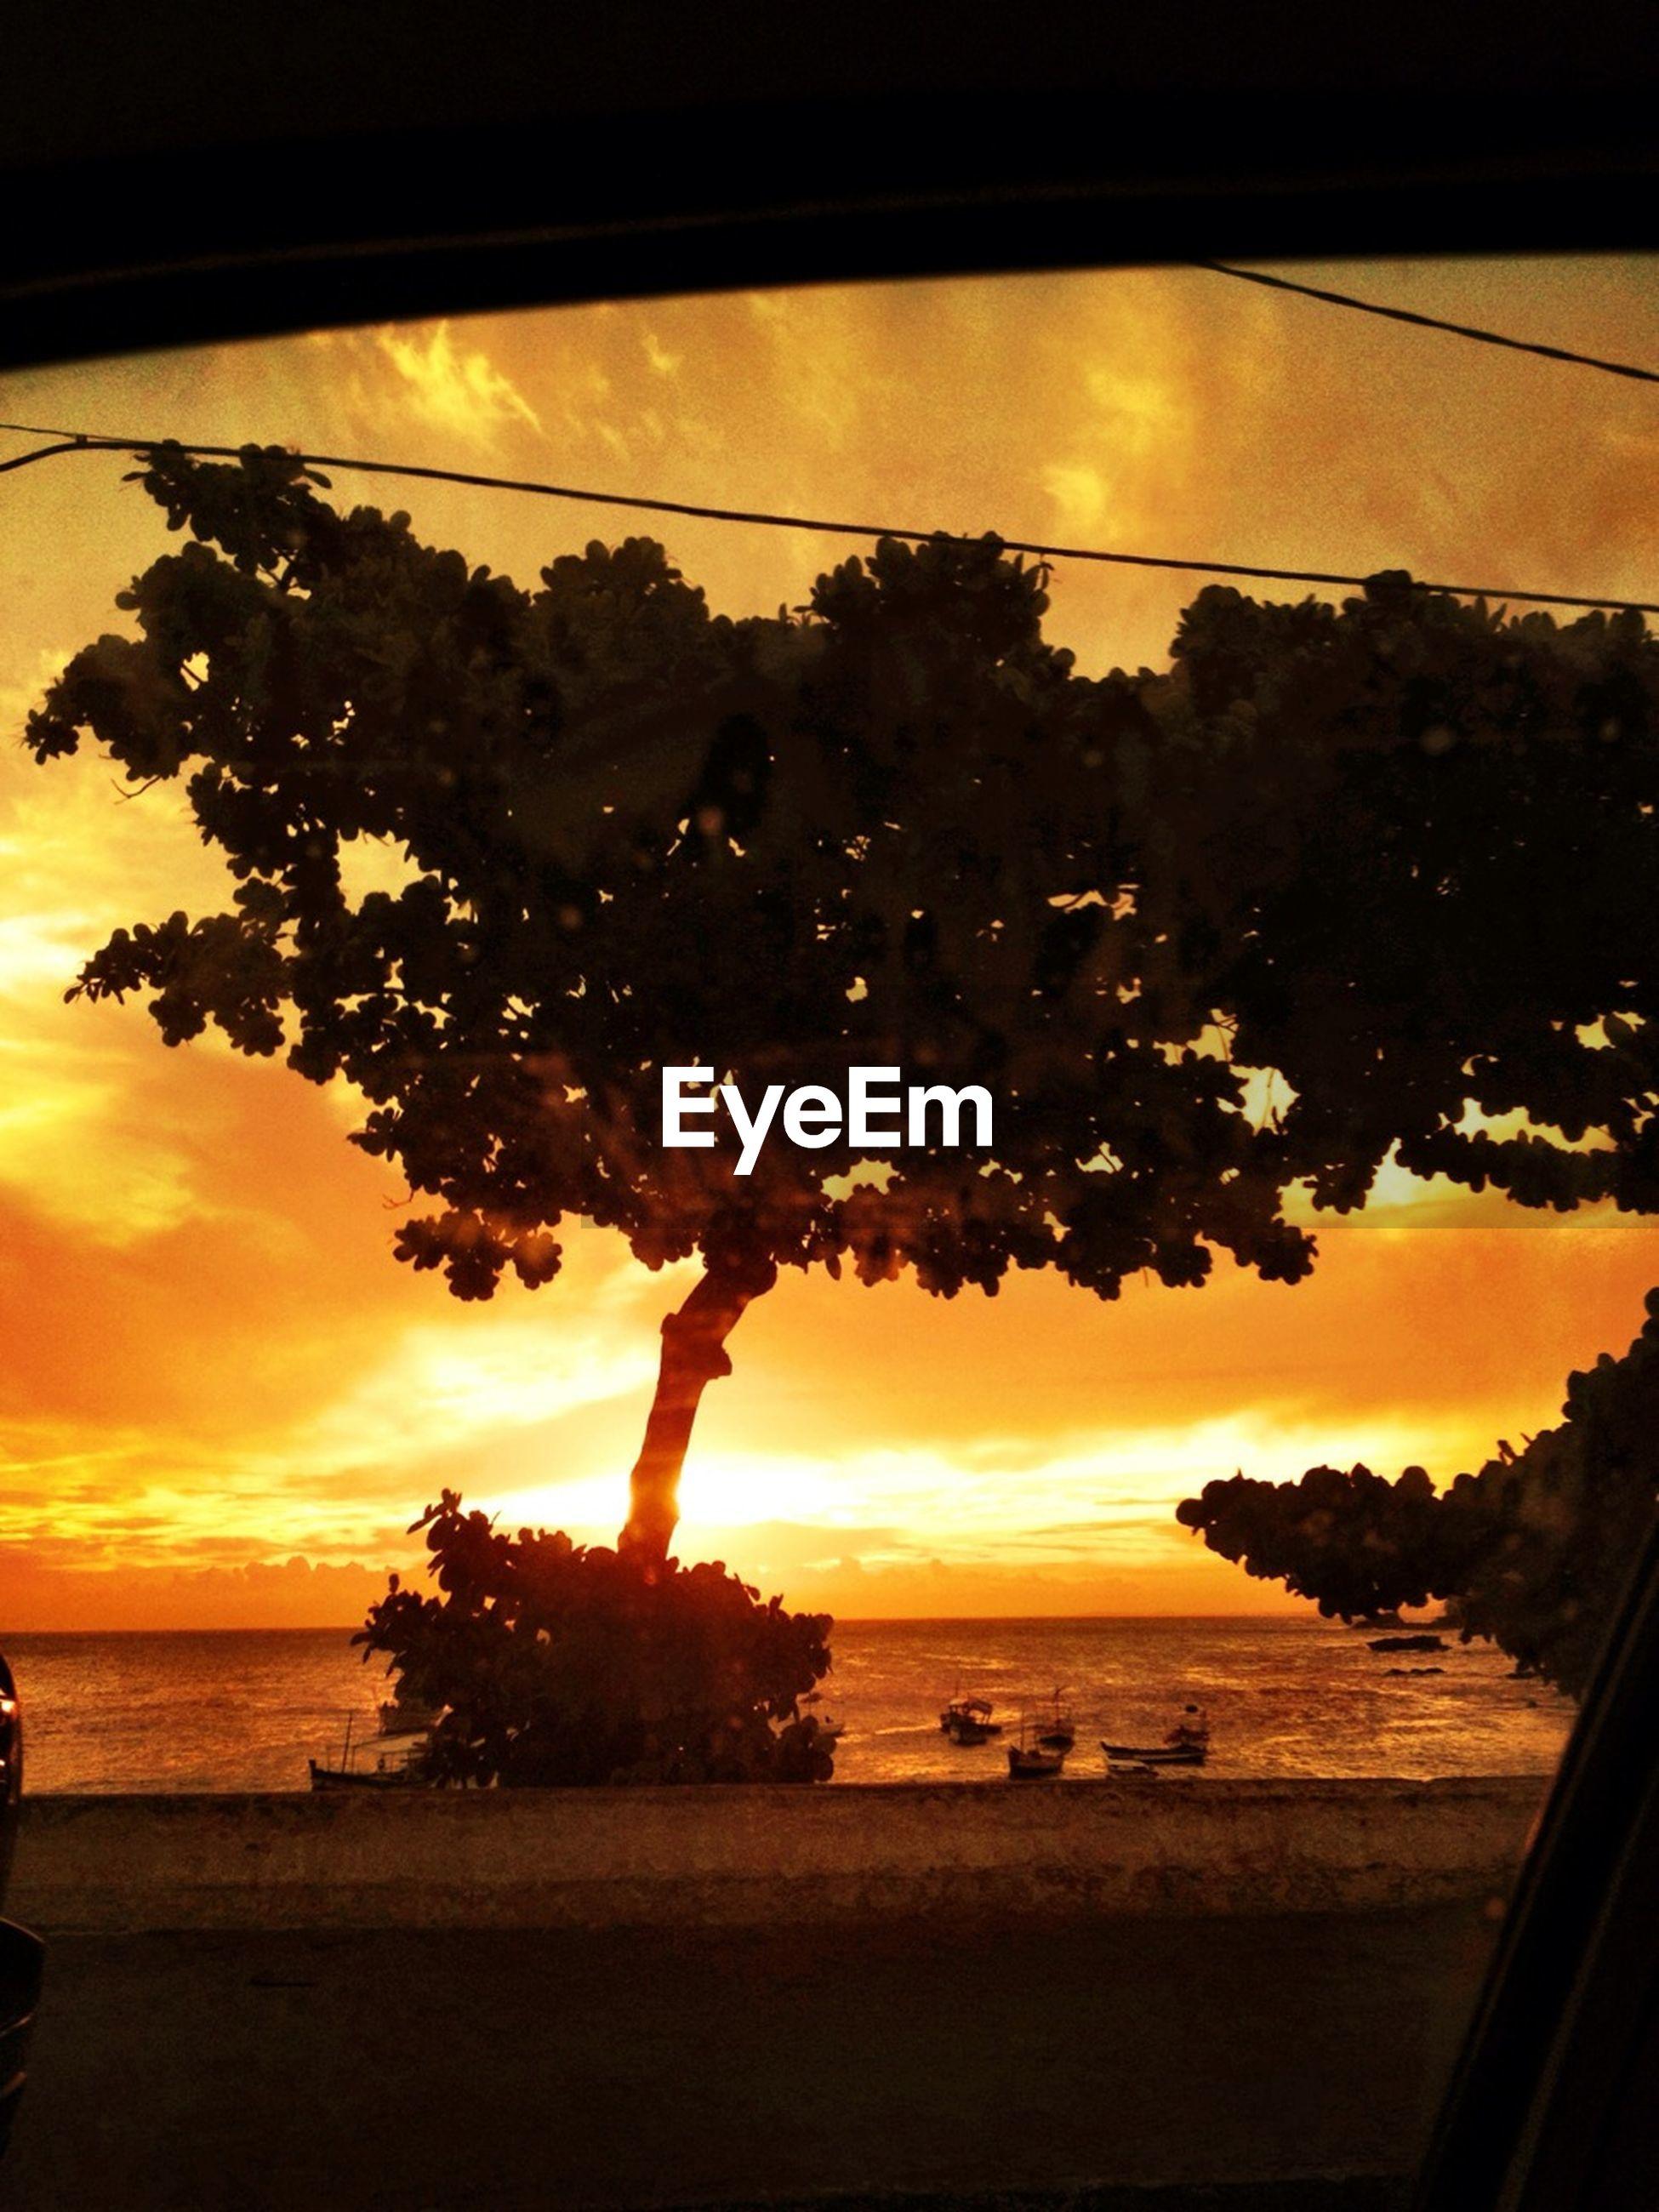 sunset, sea, beach, sky, horizon over water, sun, water, scenics, orange color, beauty in nature, tranquility, tranquil scene, silhouette, nature, shore, tree, cloud - sky, sunlight, idyllic, reflection